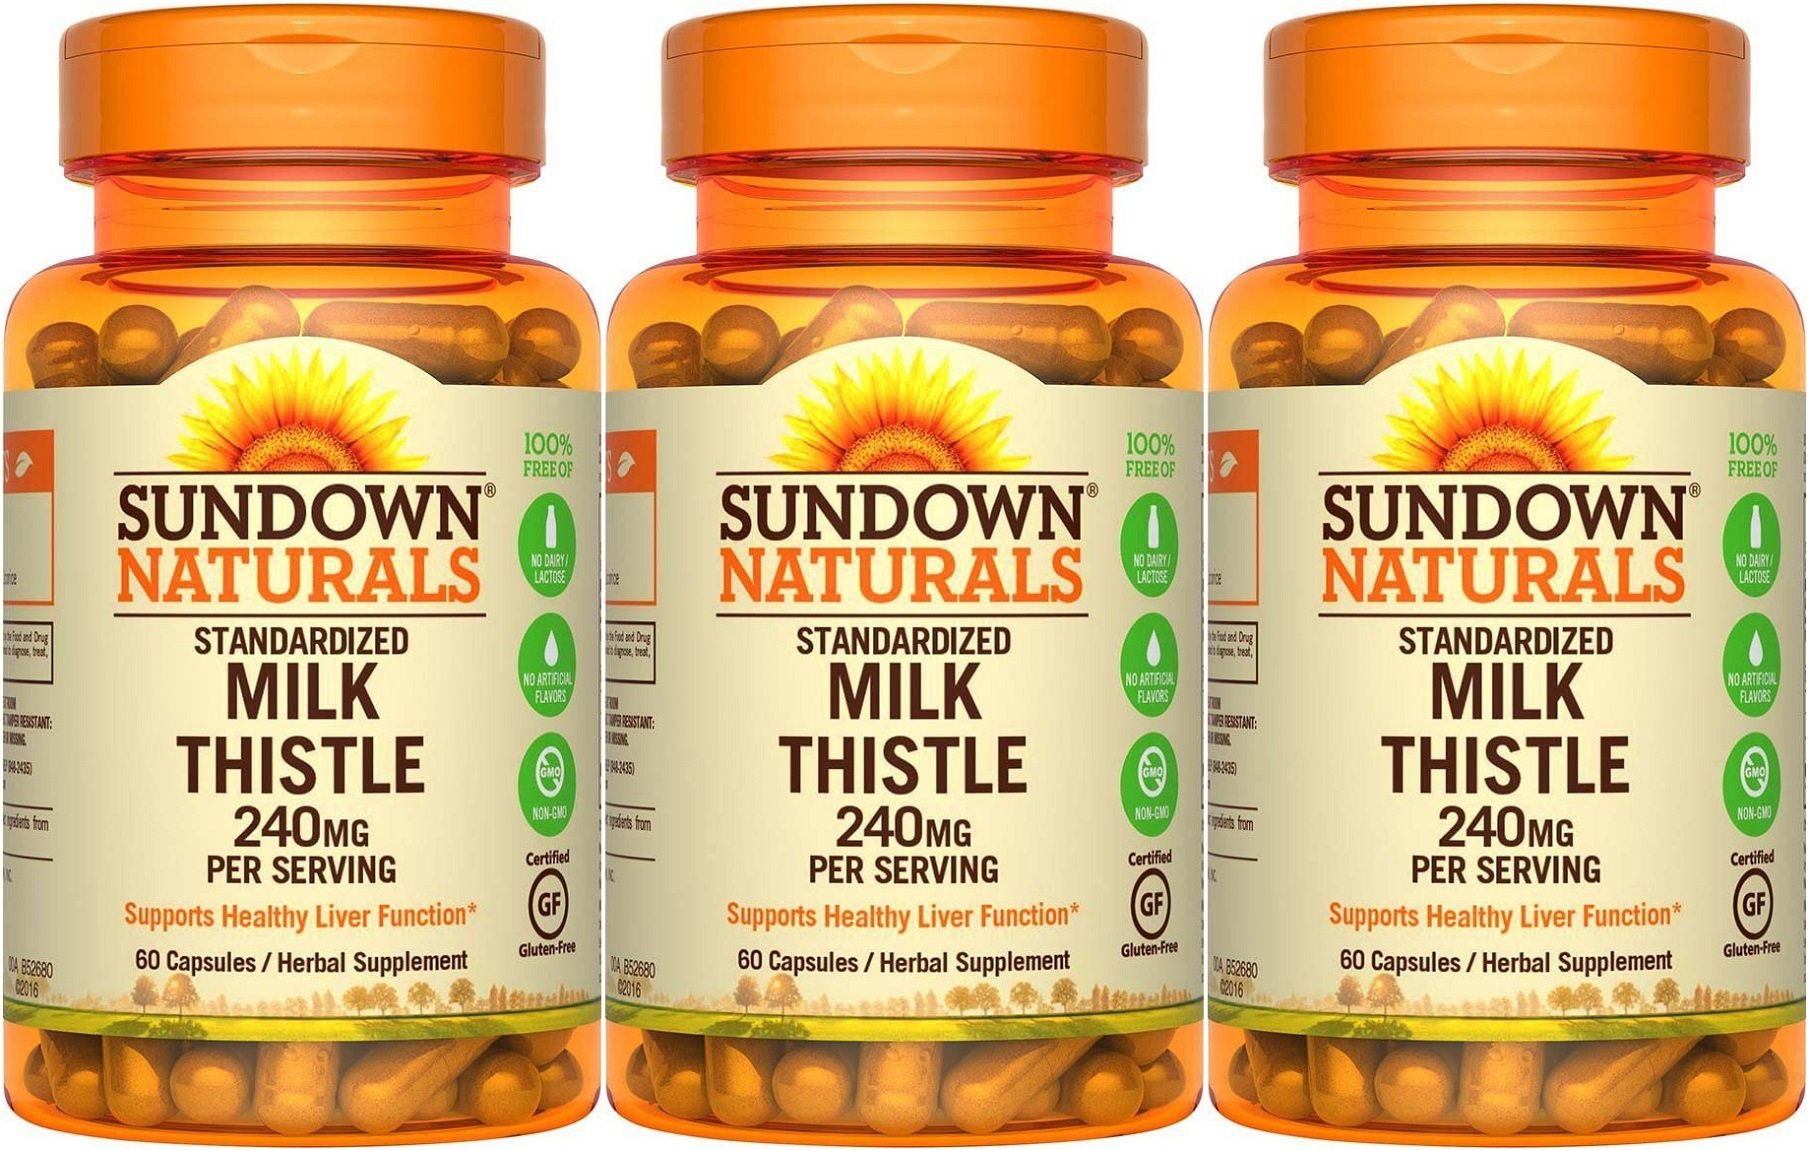 Sundown Naturals Standardized Milk Thistle 240 mg, 180 Capsules (3 X 60 Count Bottles)